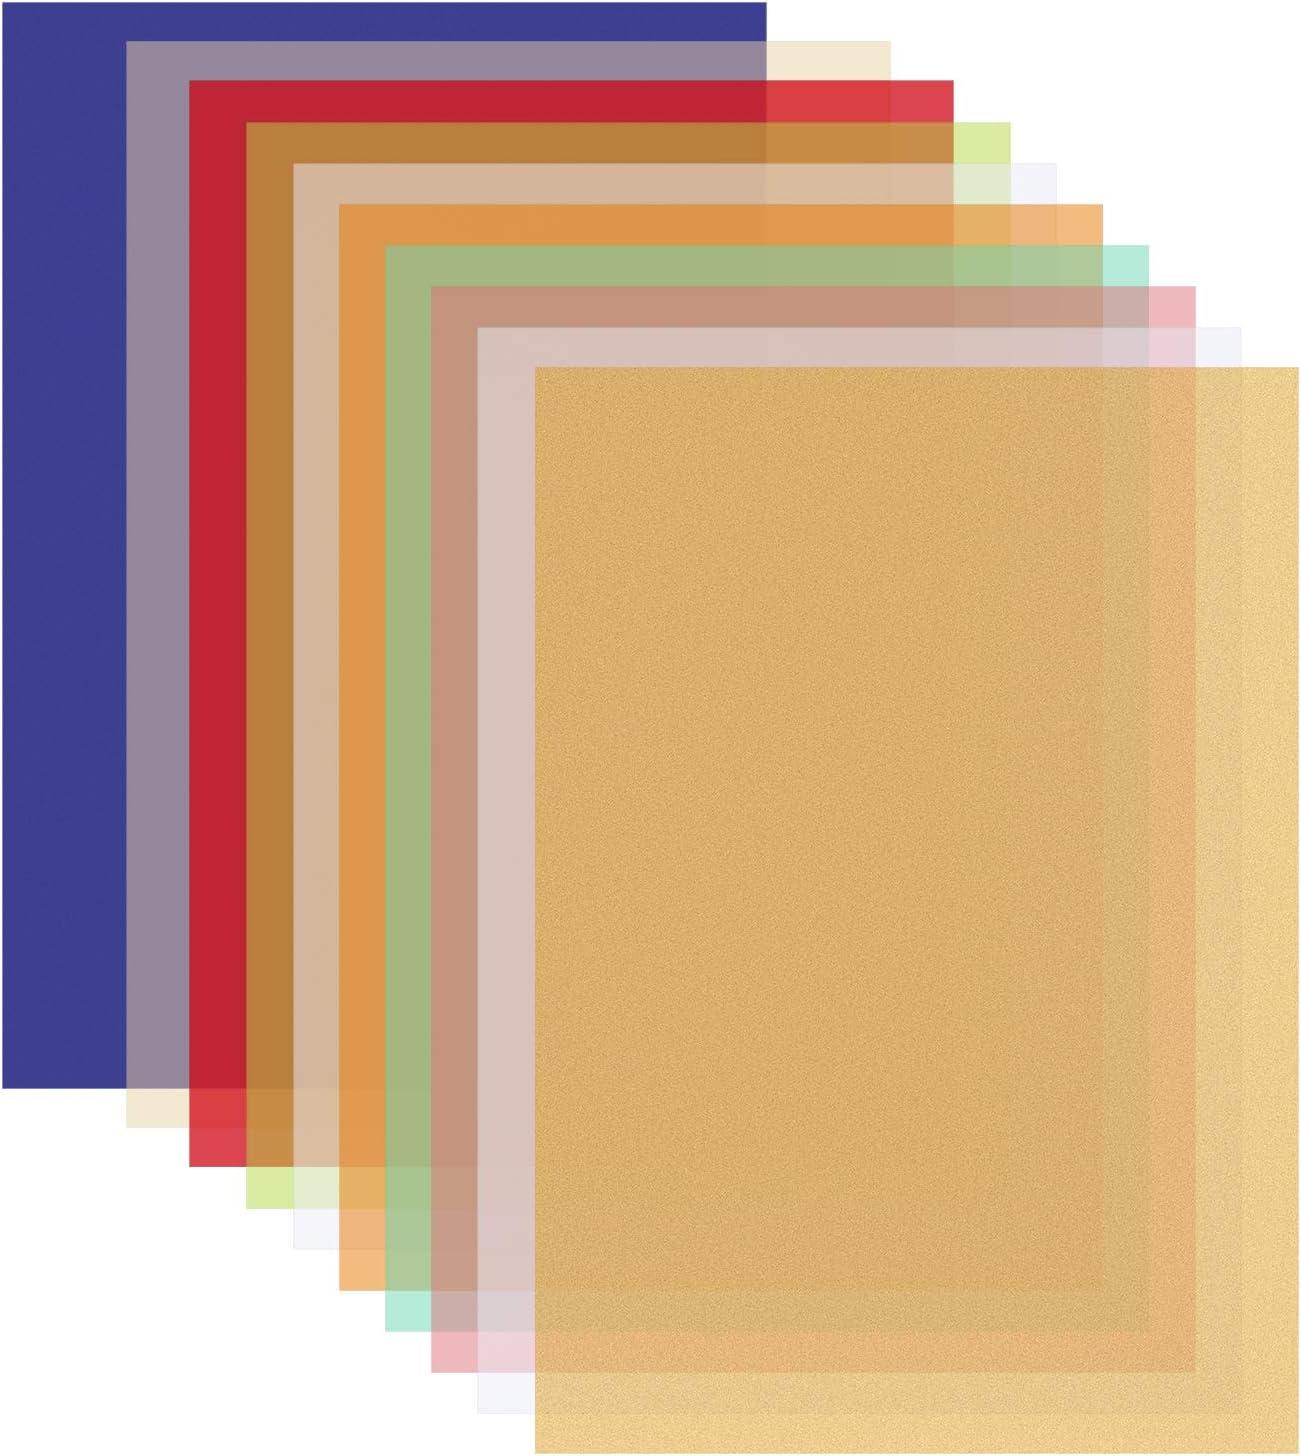 - Amazon.com: Ruisita 40 Sheets 10 Colors Vellum Paper 8.5 X 11